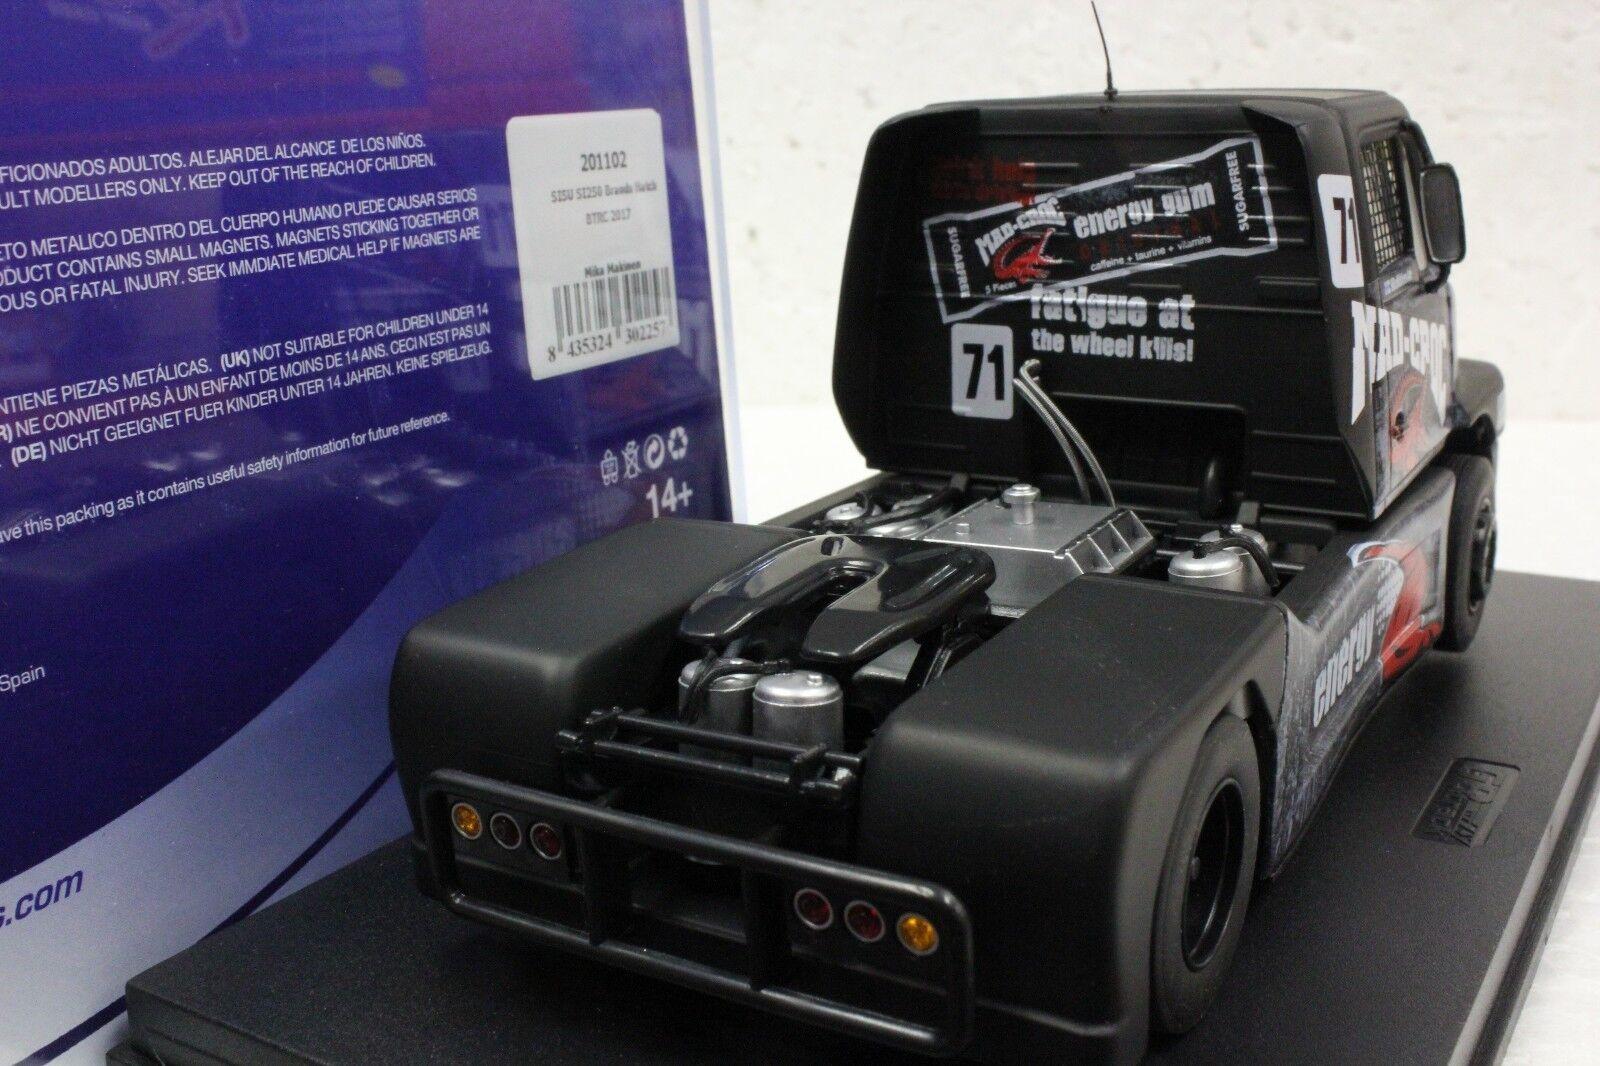 FLY 201102 SISU SI 250 BRANDS HATCH BTRC 2017 NEW 1//32 SLOT CAR IN DISPLAY CASE